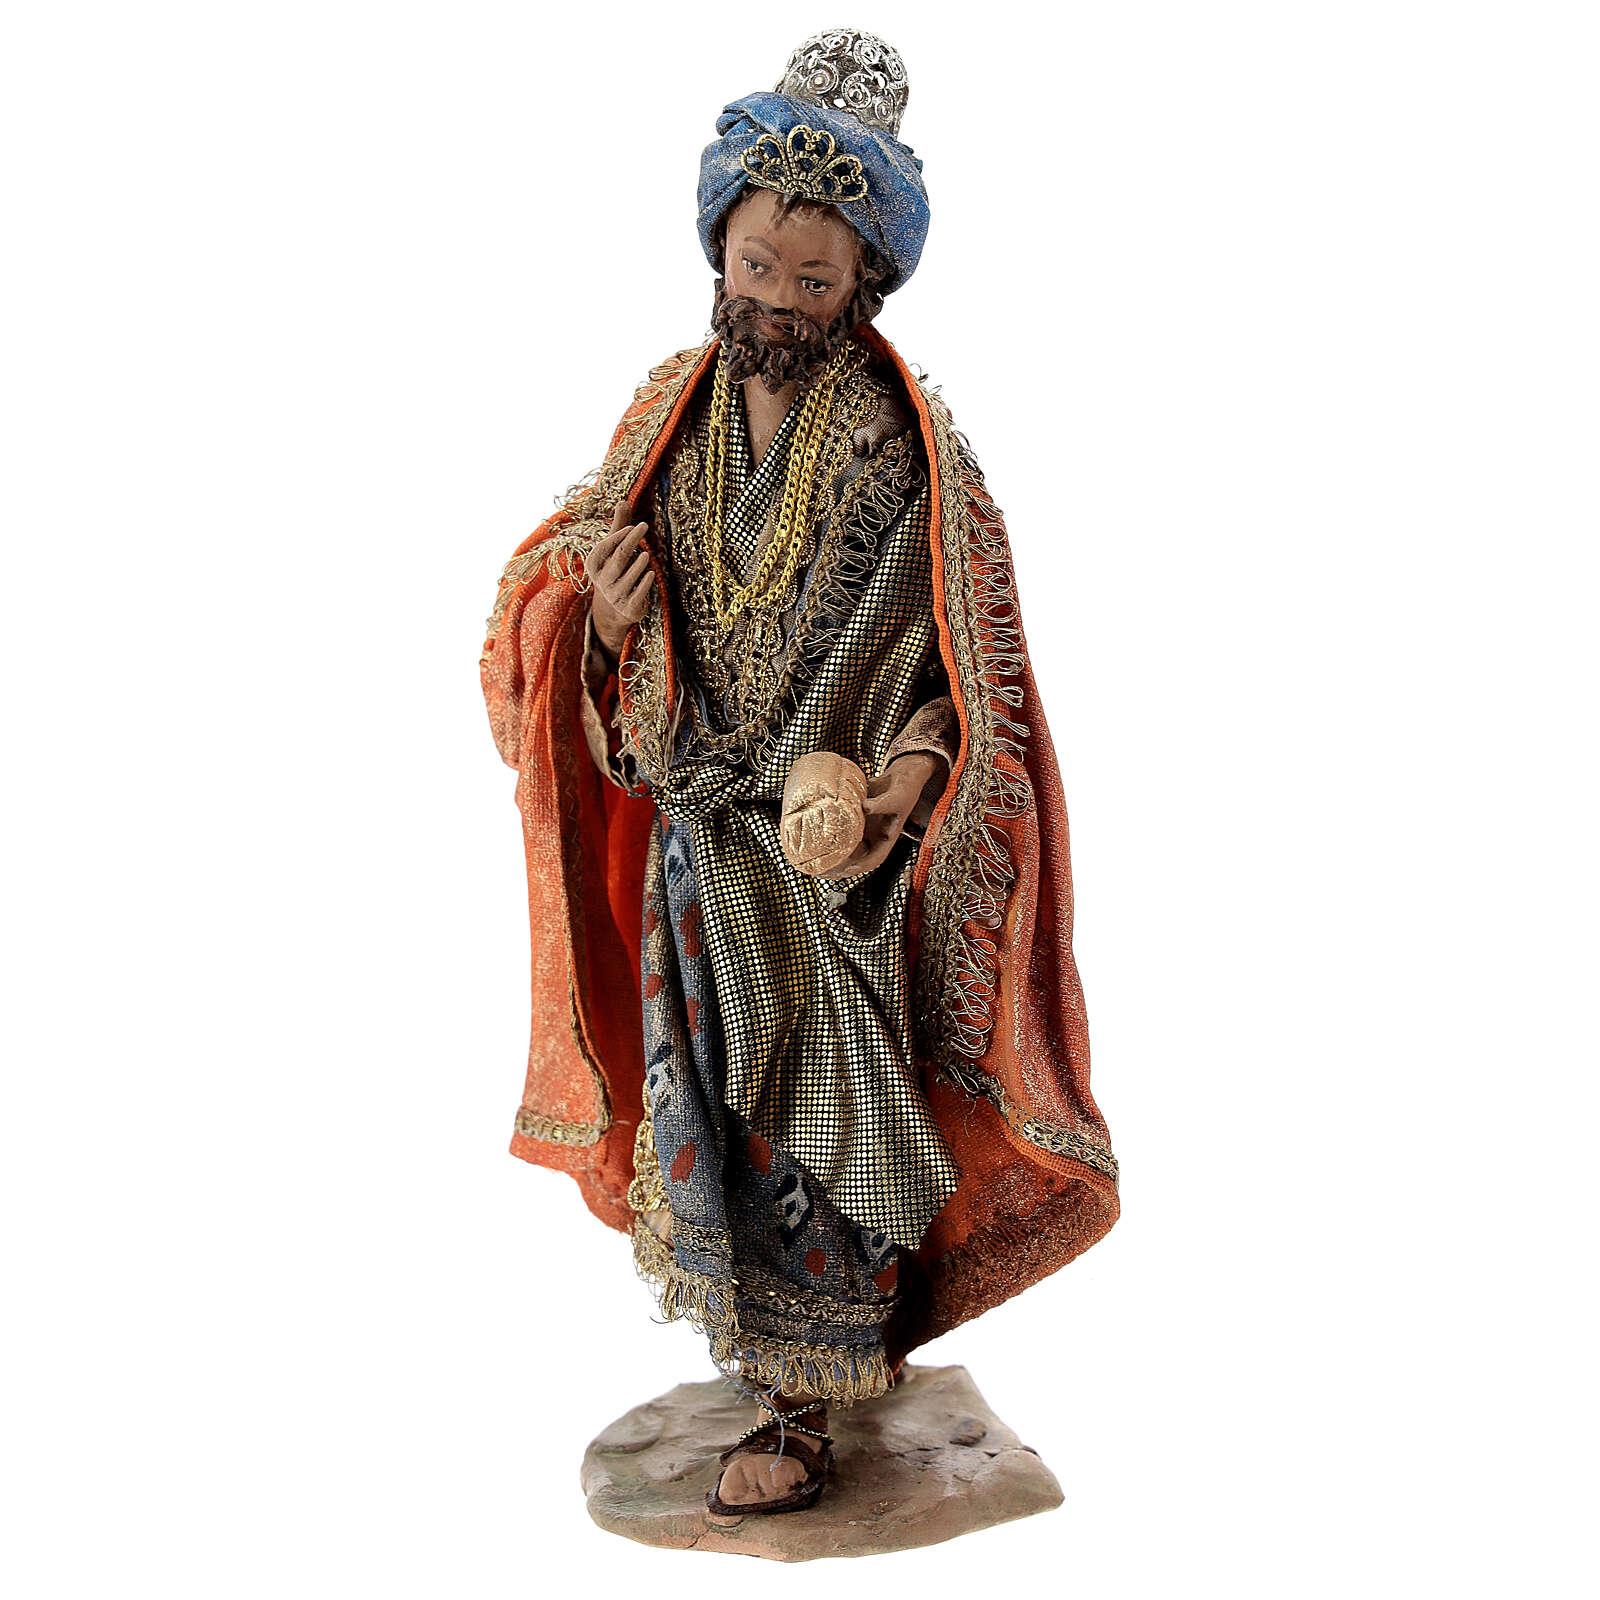 Nativity scene figurine, Standing King with gift by Angela Tripi 13 cm 4